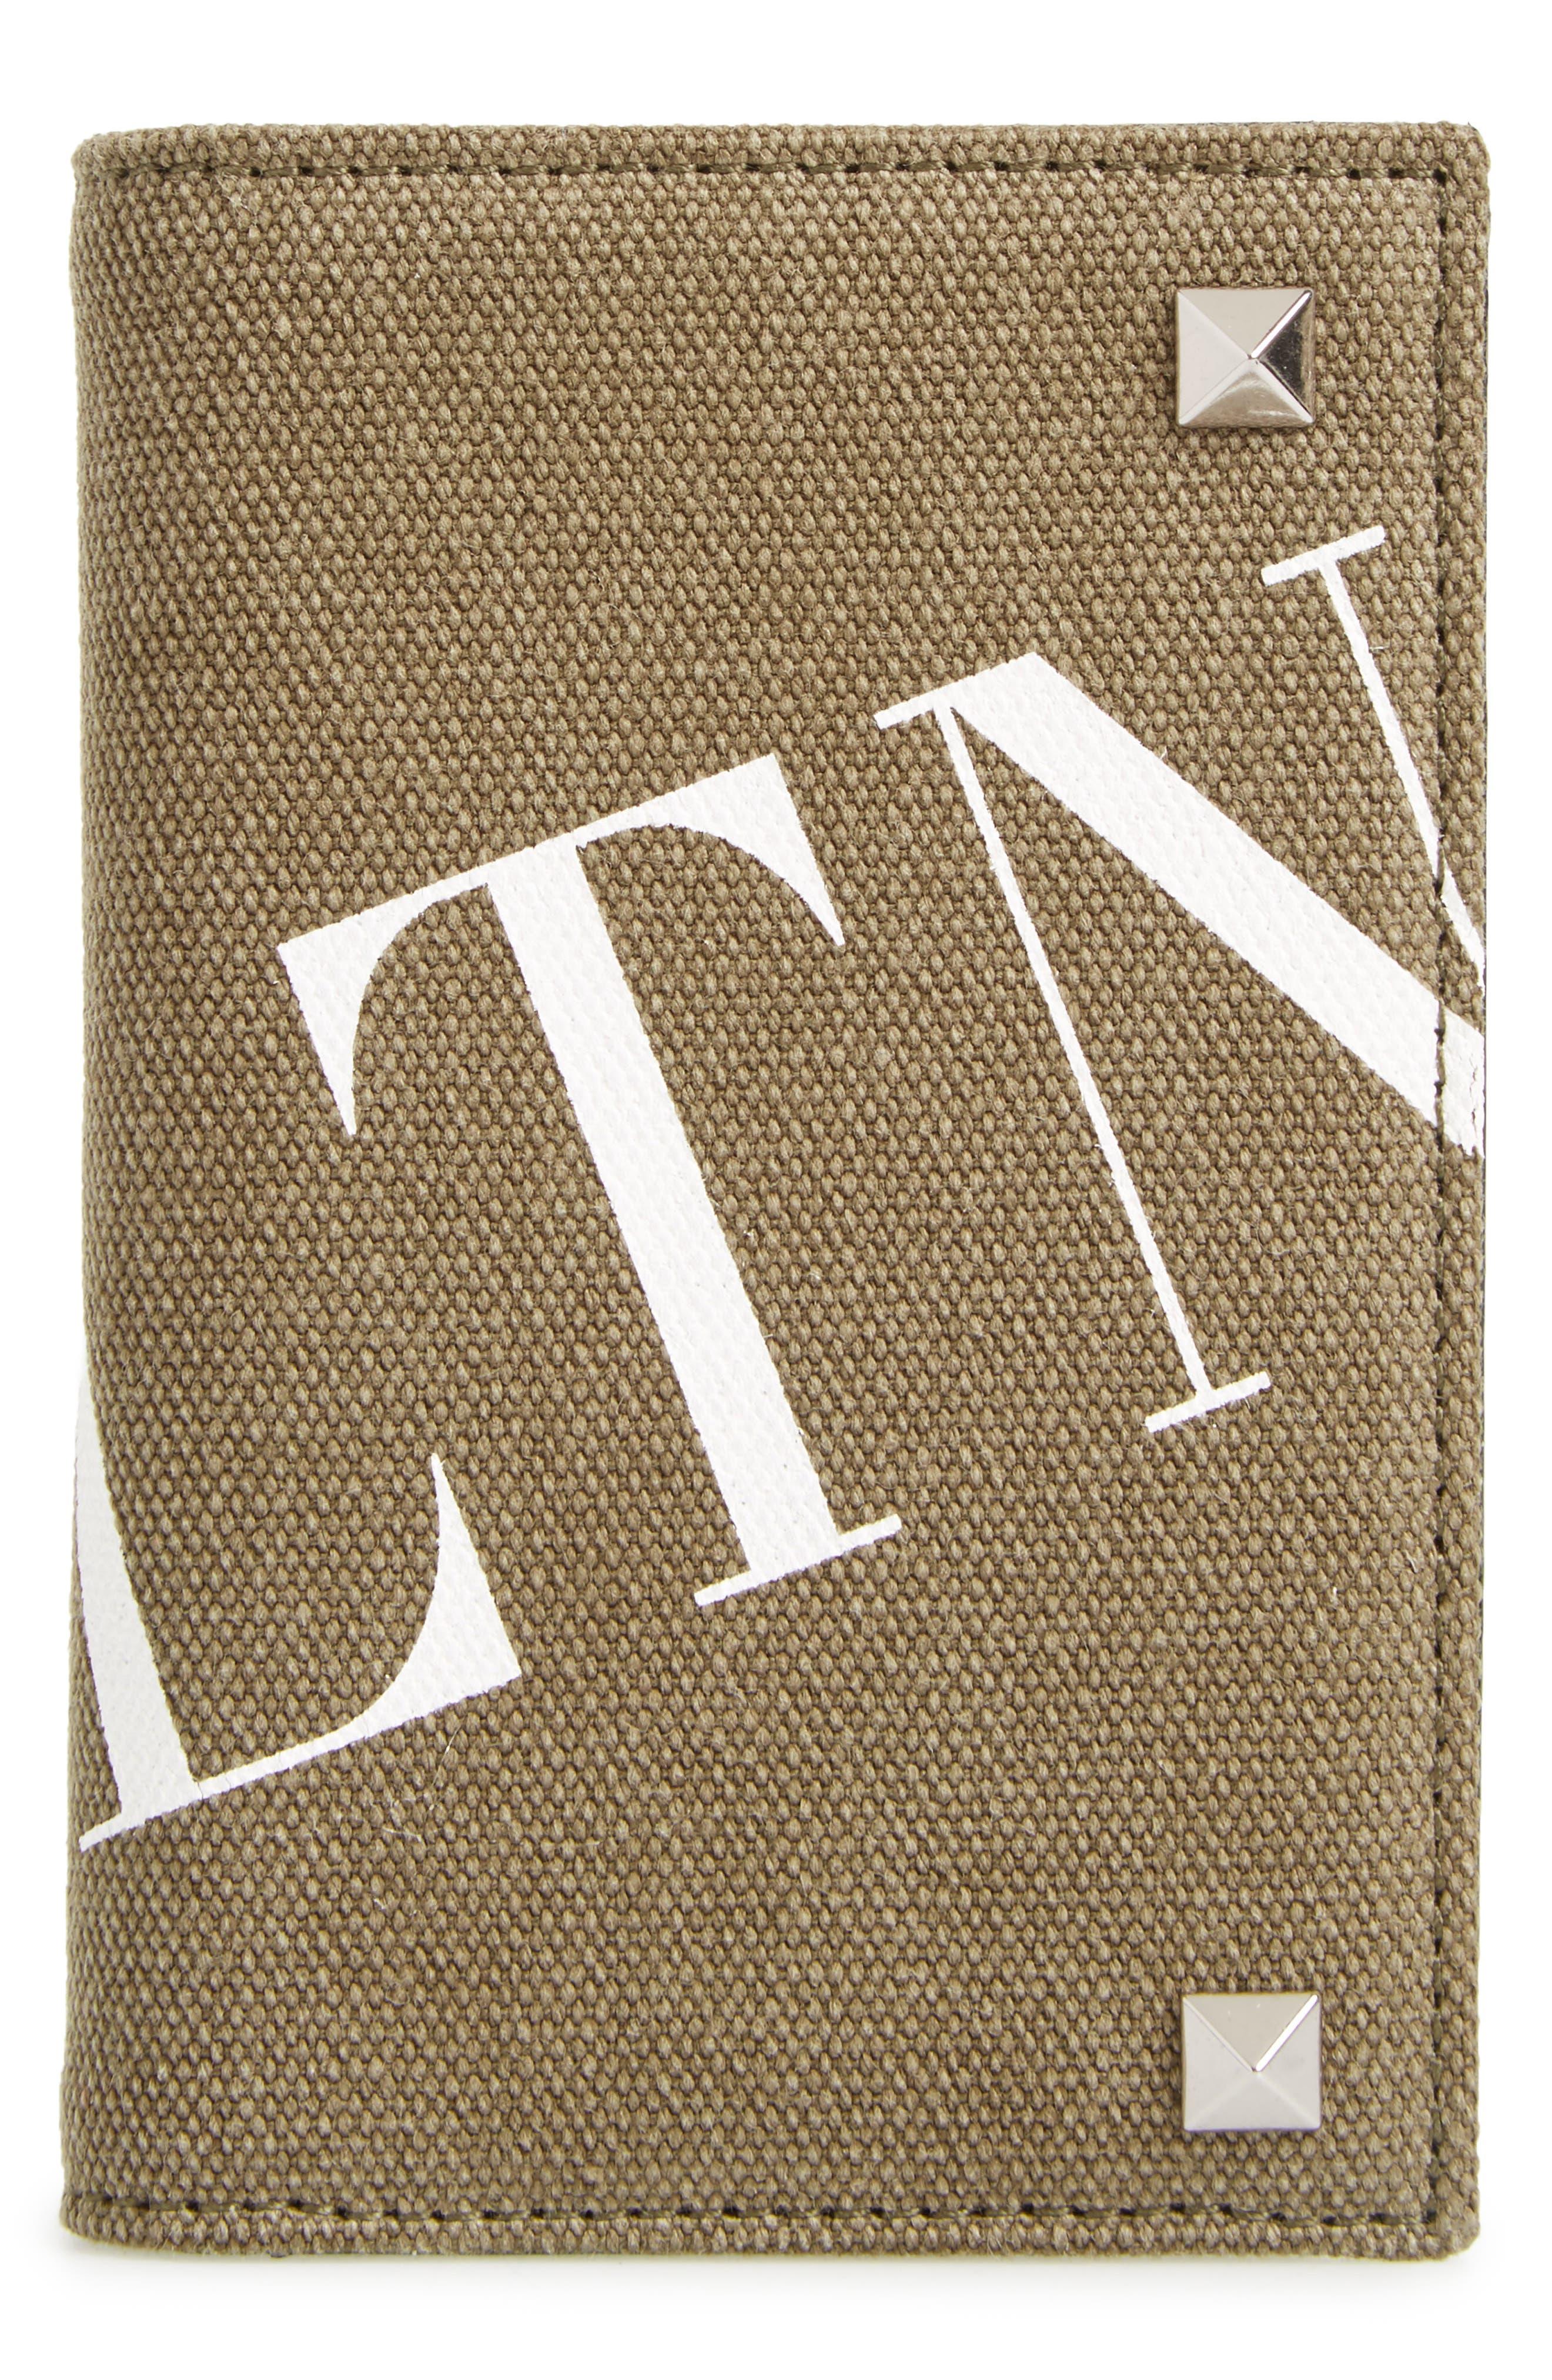 GARAVANI Stud Canvas Wallet,                             Main thumbnail 1, color,                             370